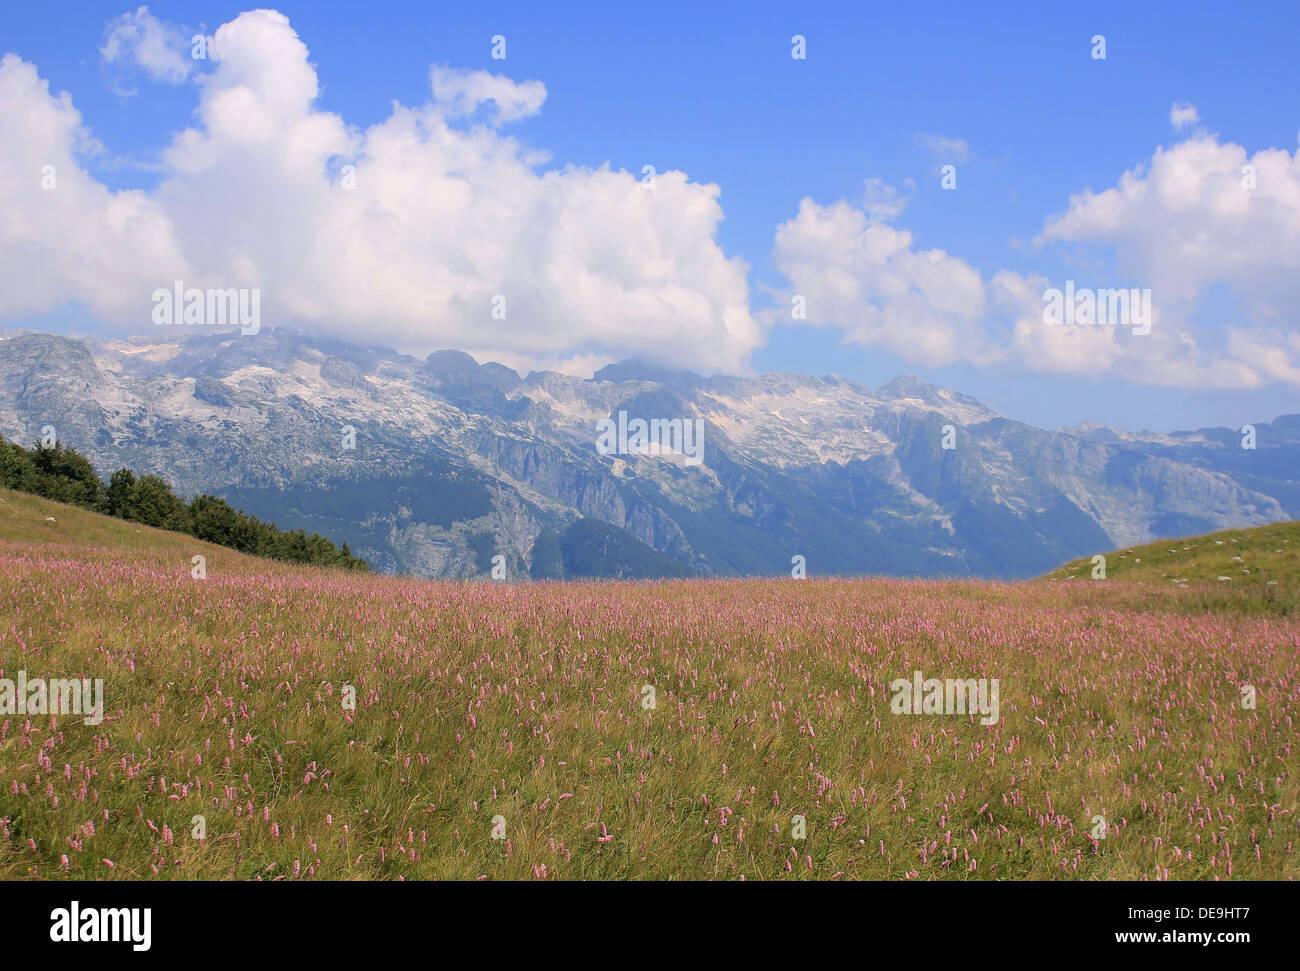 Colorful alpine meadow, Alpe Adria Trail, Julian Alps, Slovenia, Central Europe - Stock Image